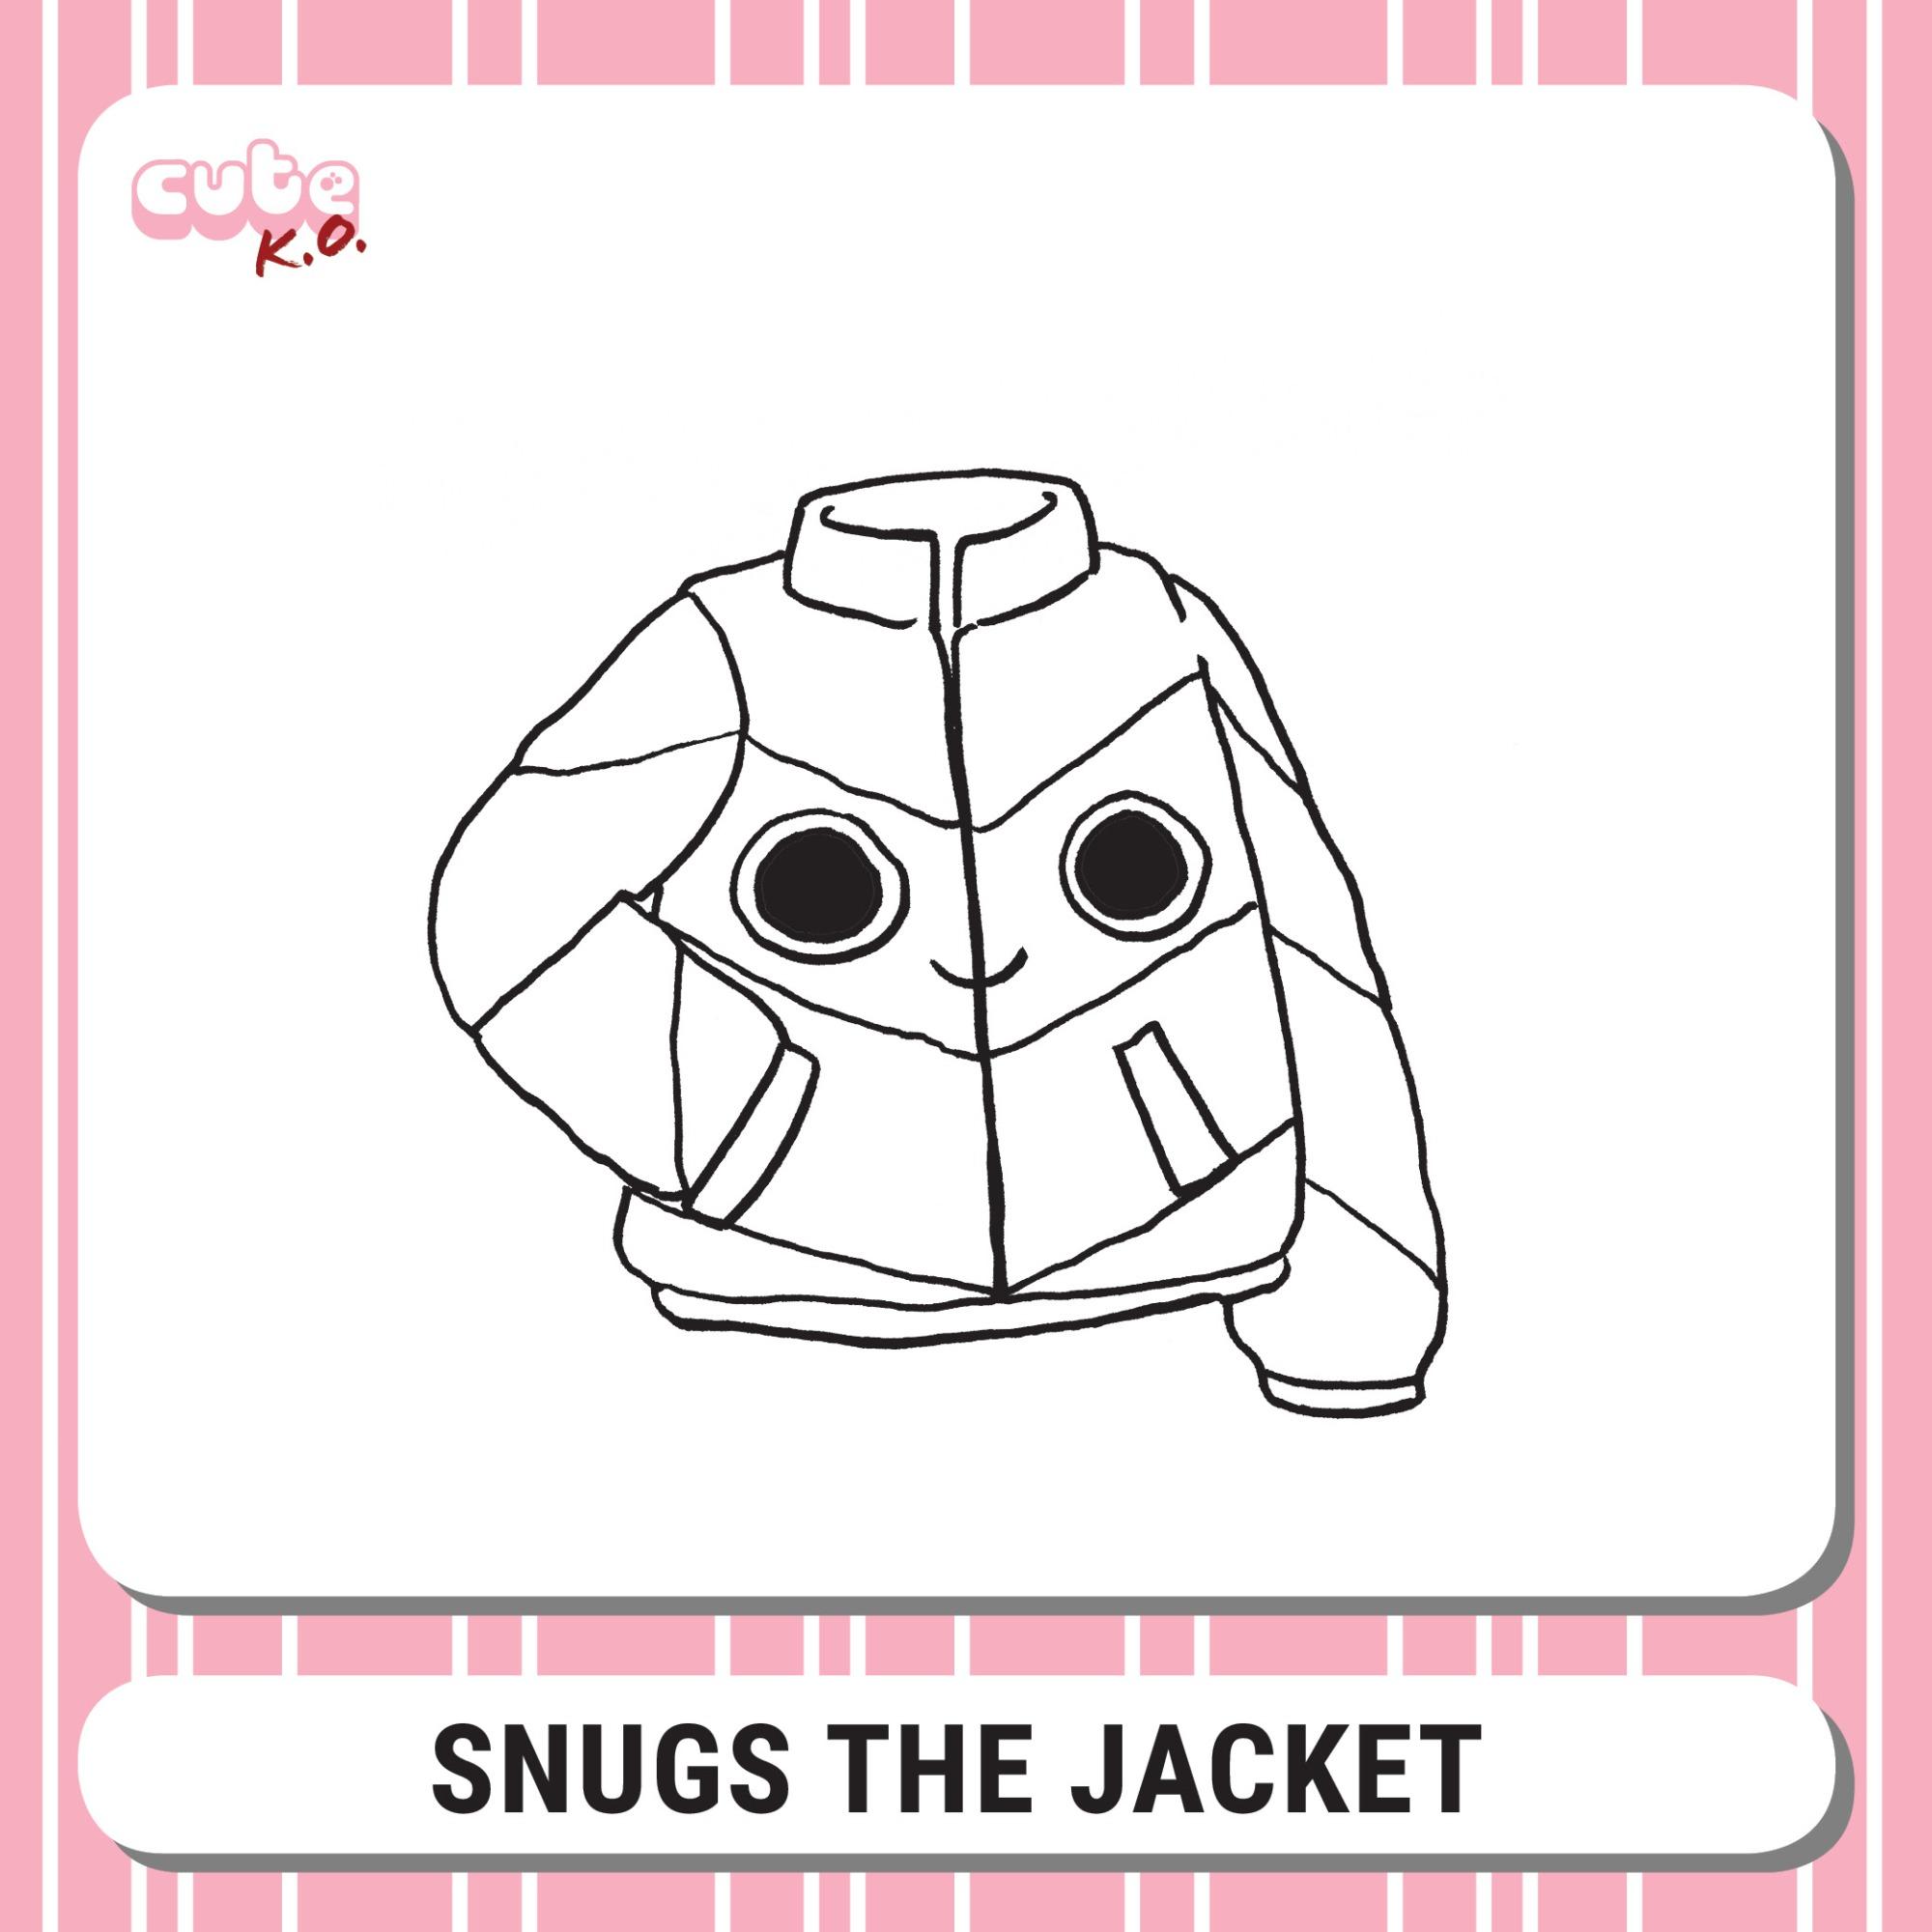 Cute K.O. 2019 Round One: Snugs the Jacket